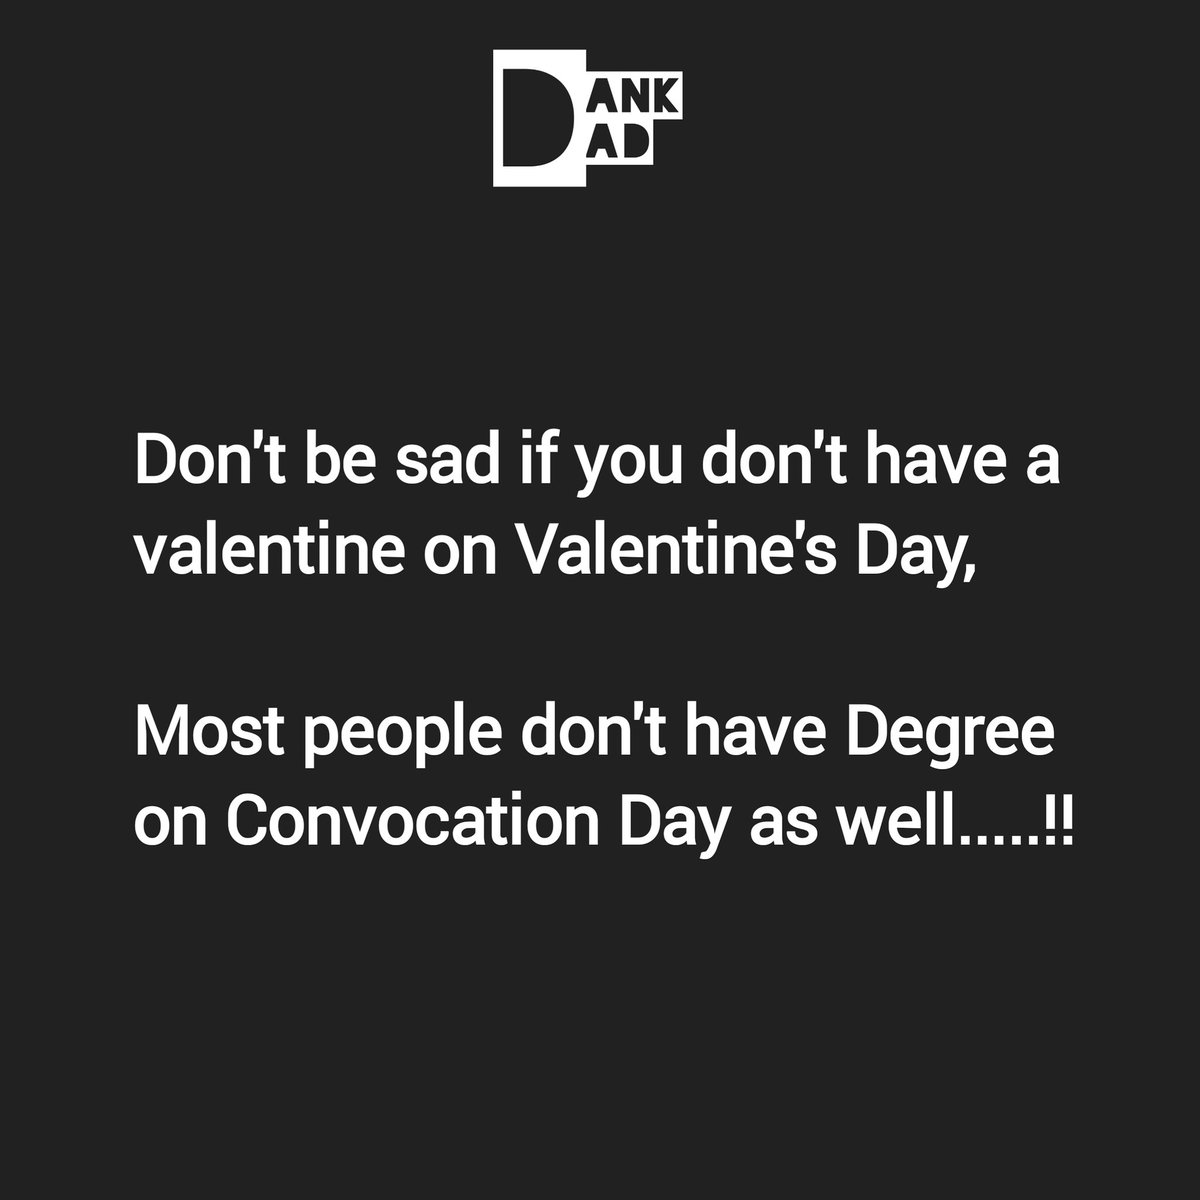 Follow @_dank_dad_ for more ....#fun #jokeoftheday #laugh  #dankjokes #nonvegjokes #follow #funny #jokes #sarcasm #FF #likes #comedyindia #backchodi #sacredmemes #bollywoodpic.twitter.com/PFImKoxnsk